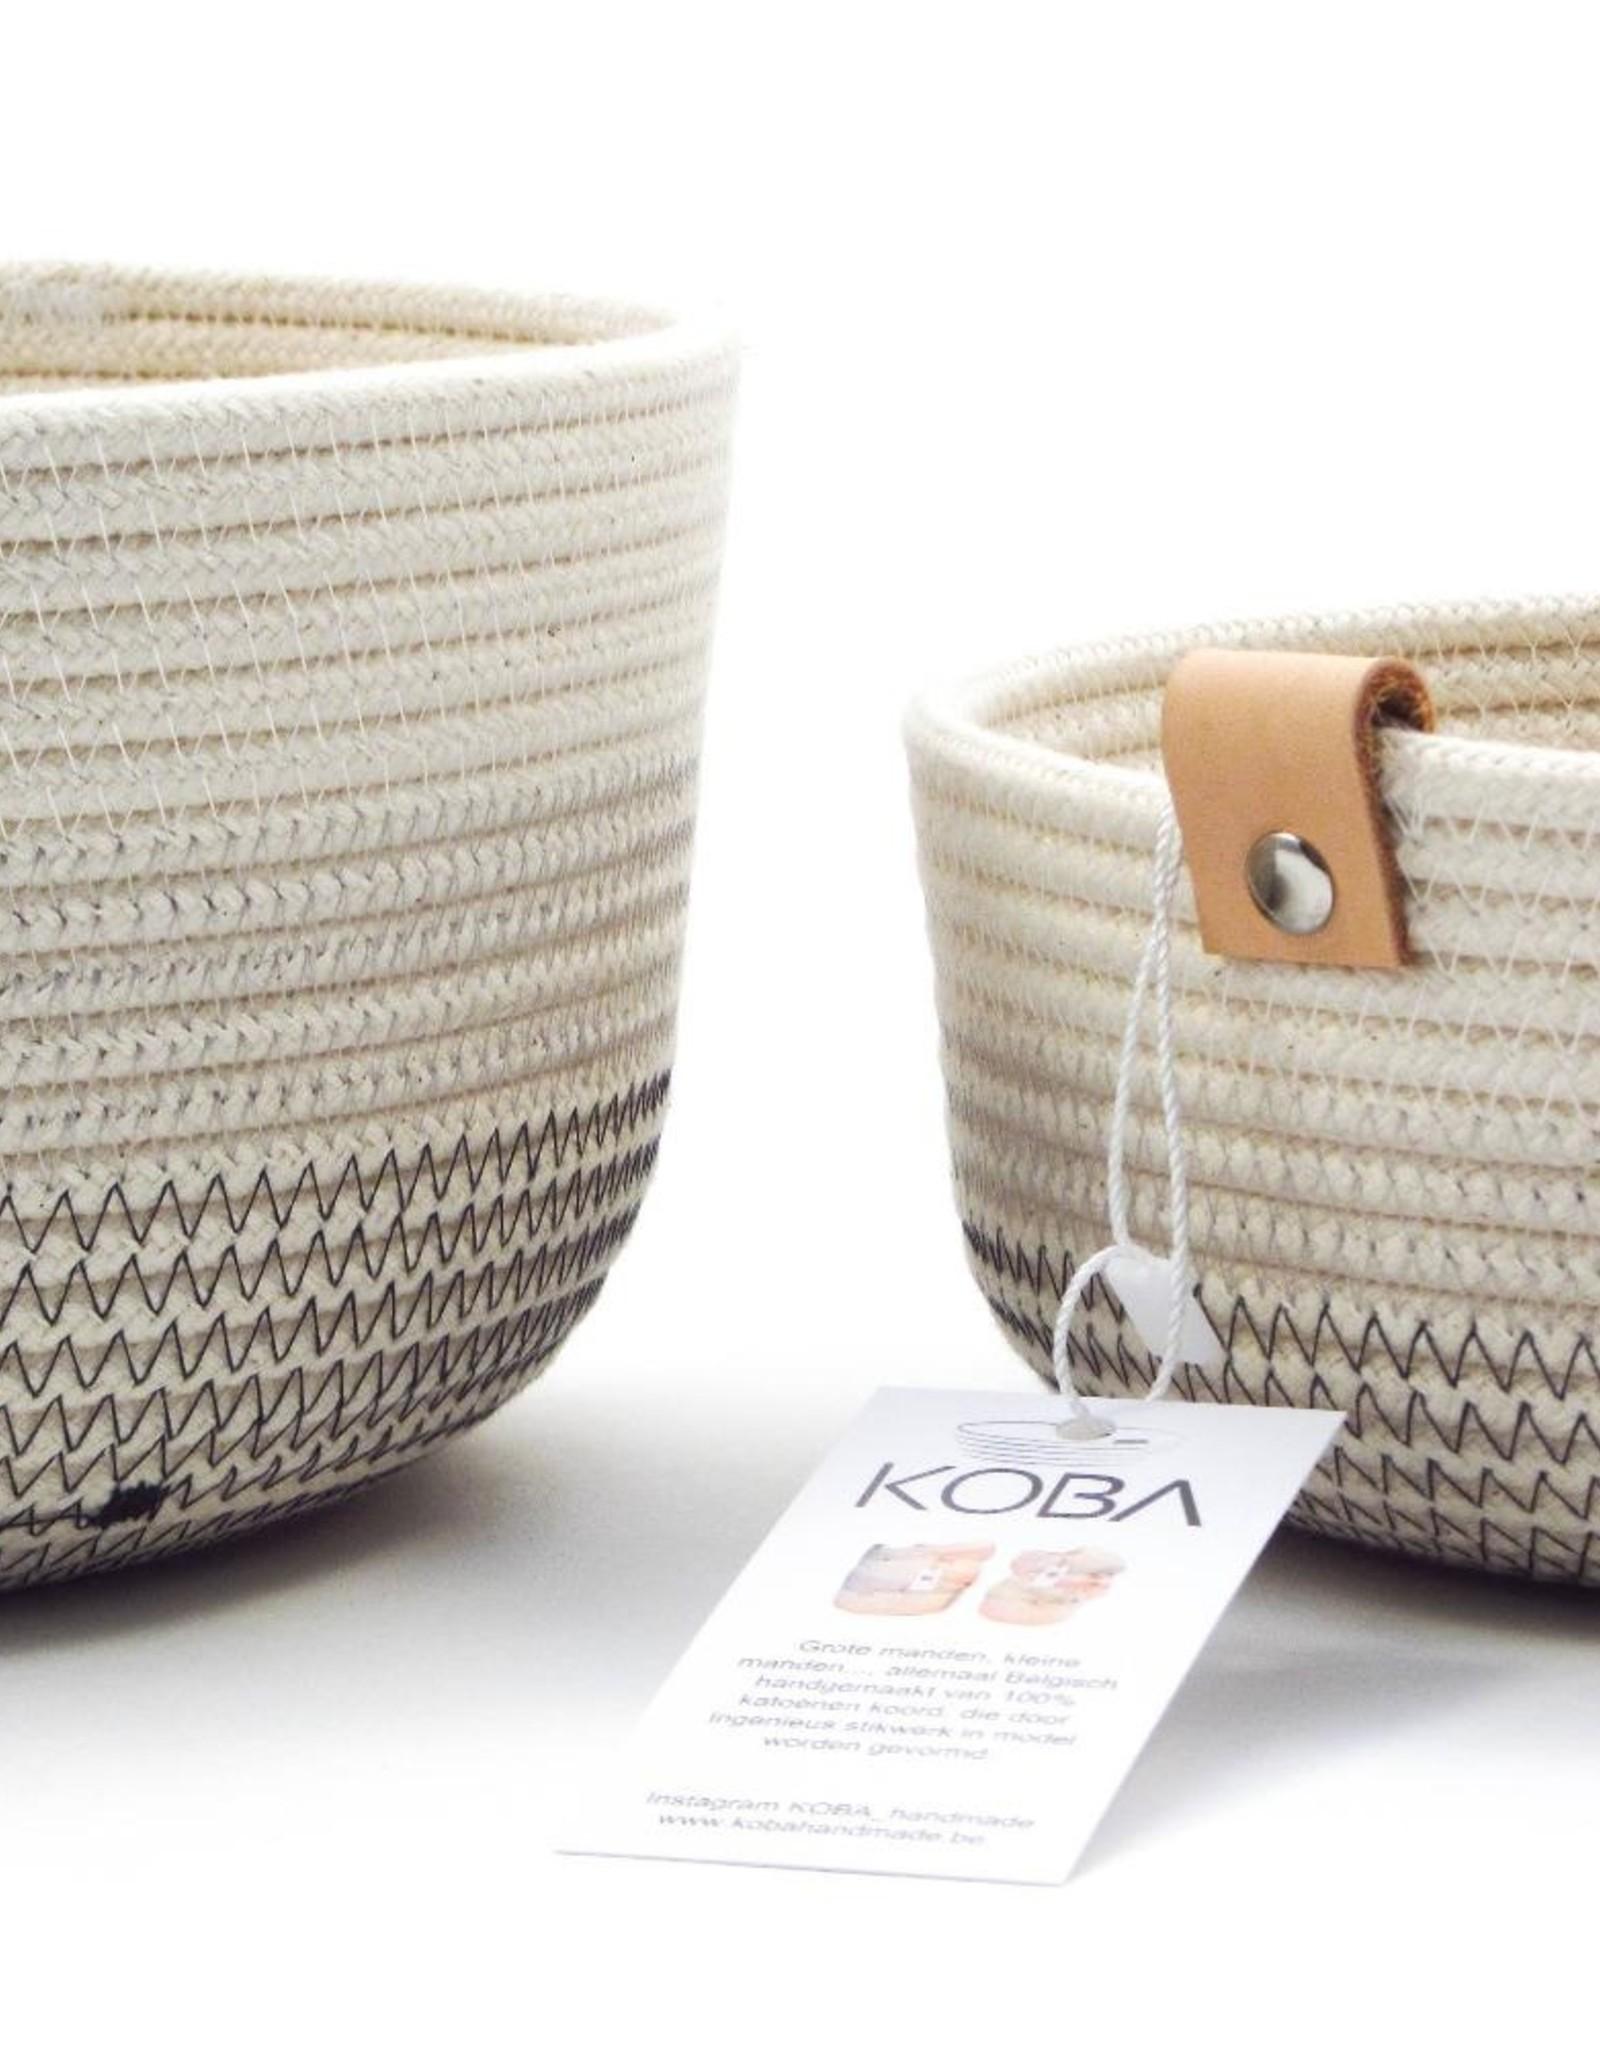 Koba Handmade Bowl Large High-shades of grey 25x12cm